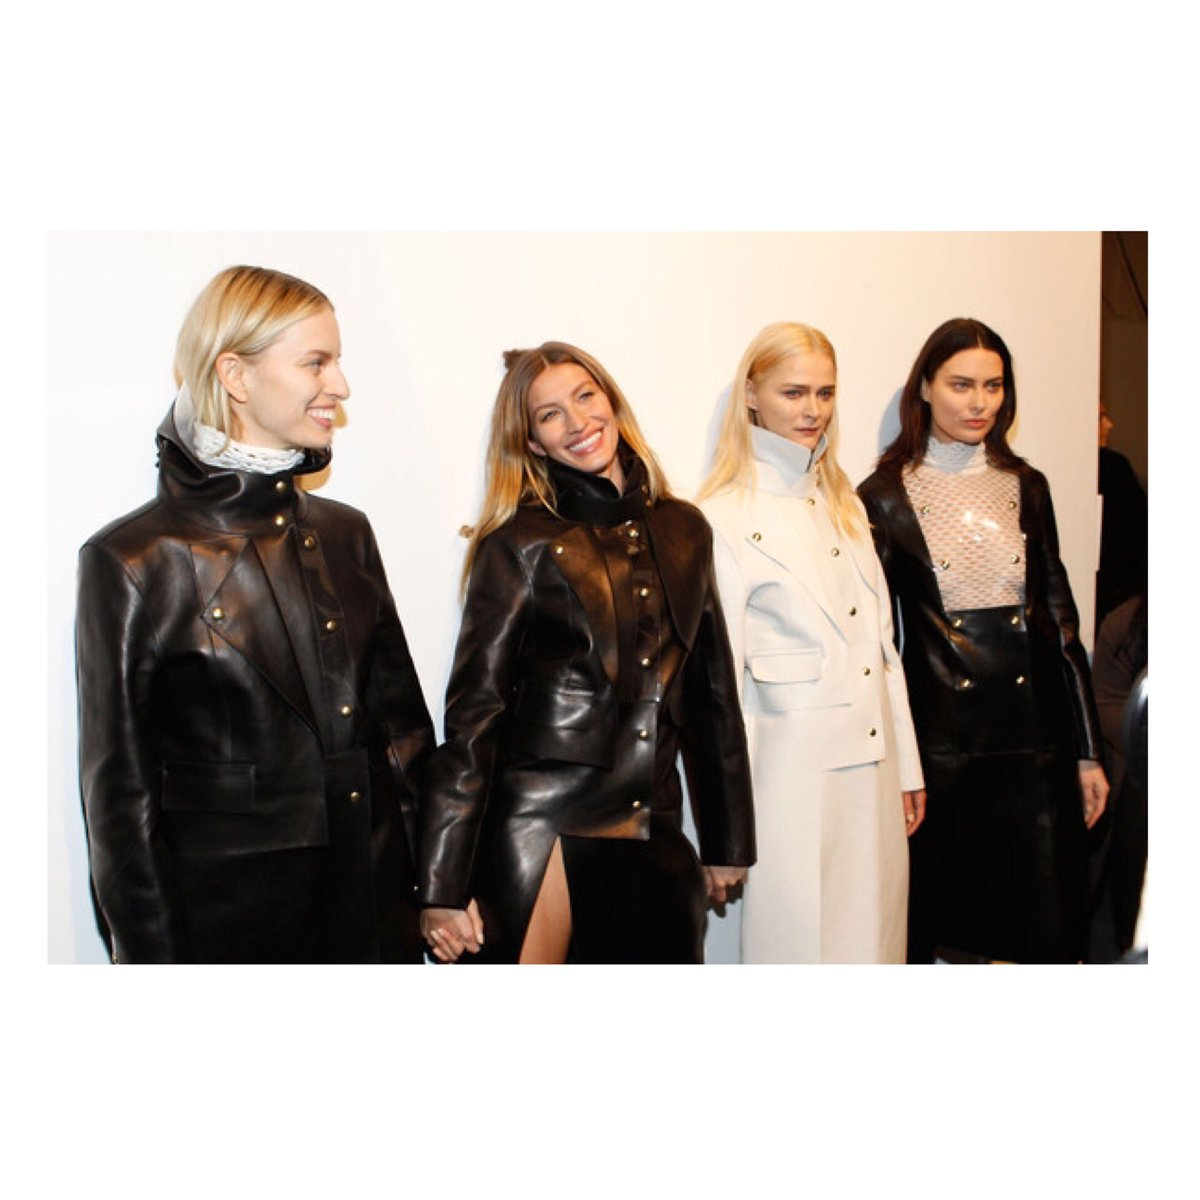 Modelslife Latest News Breaking Headlines And Top